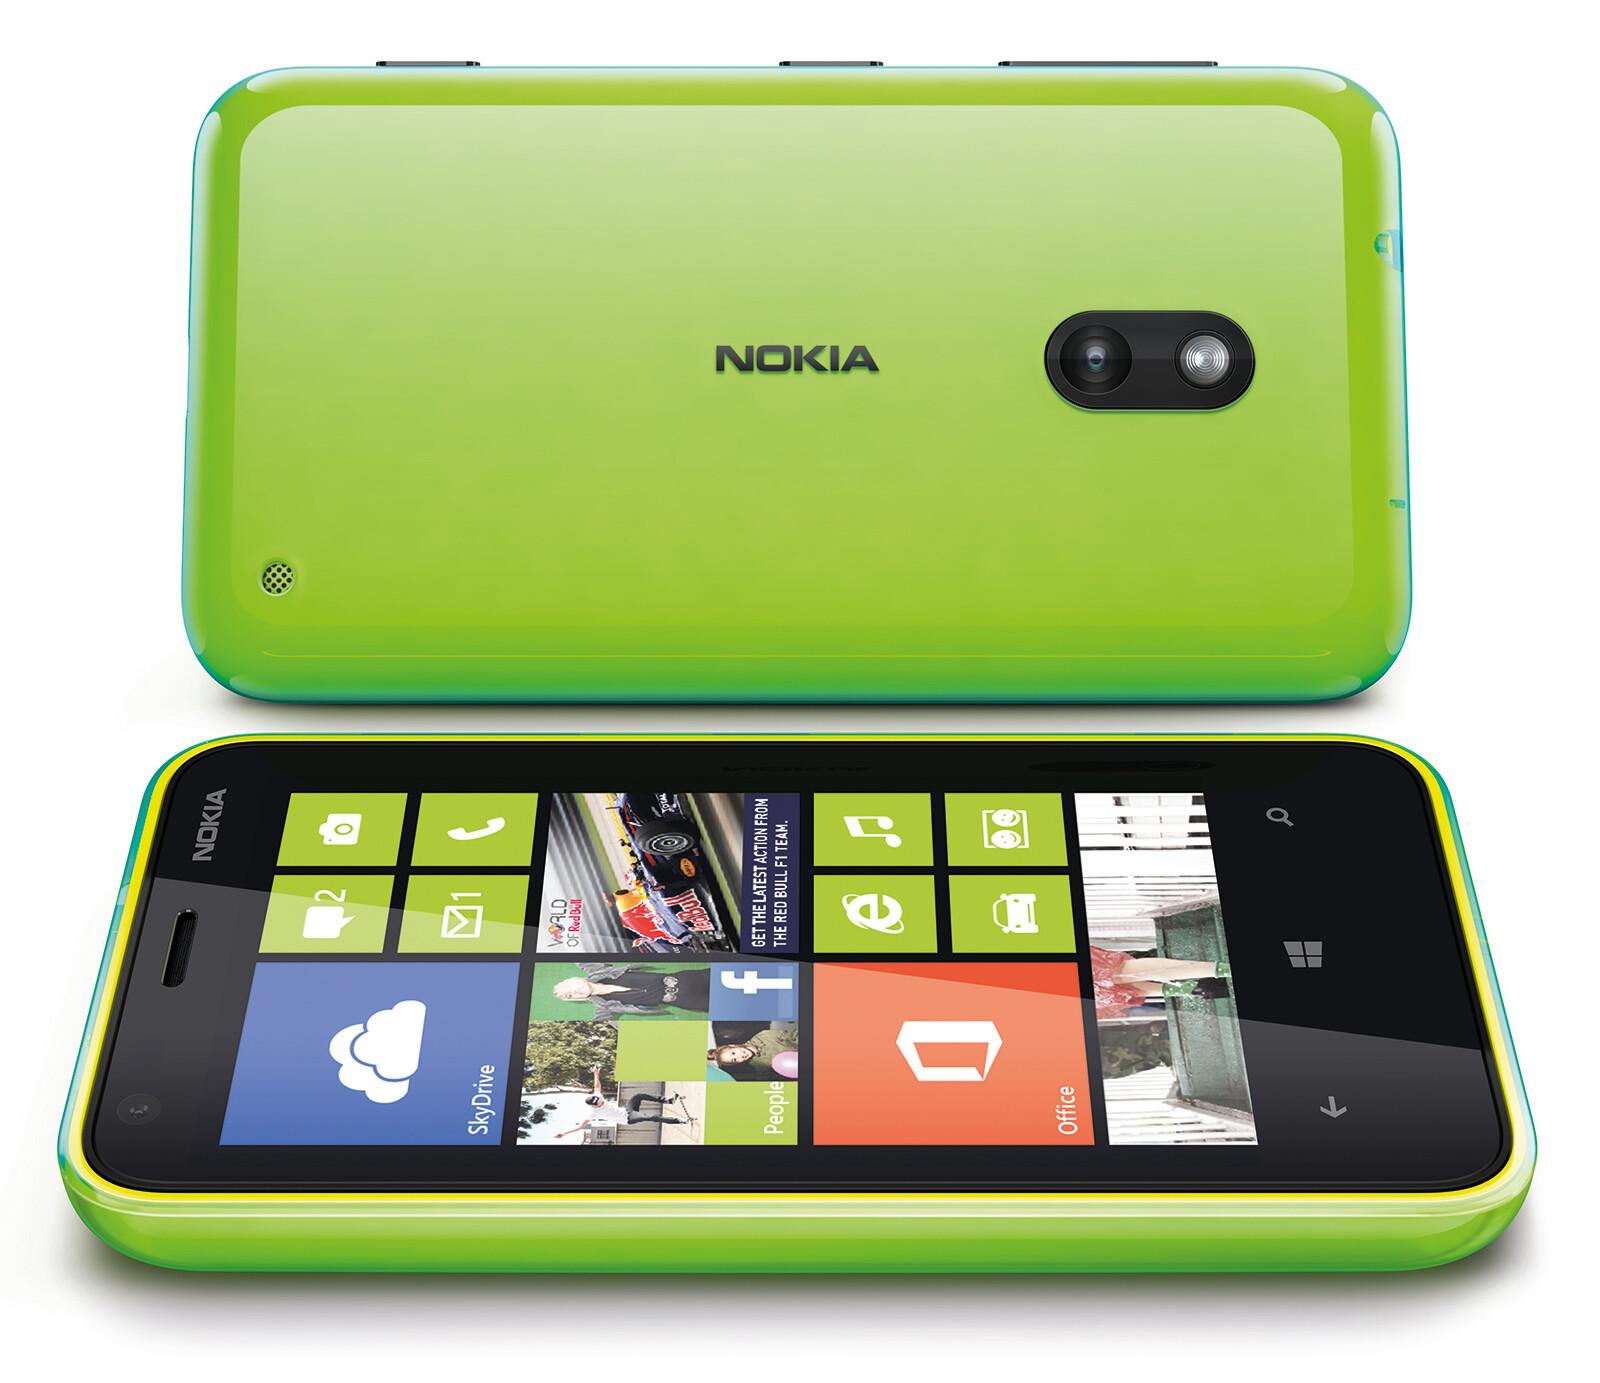 Nokia Lumia 620 - Характеристики